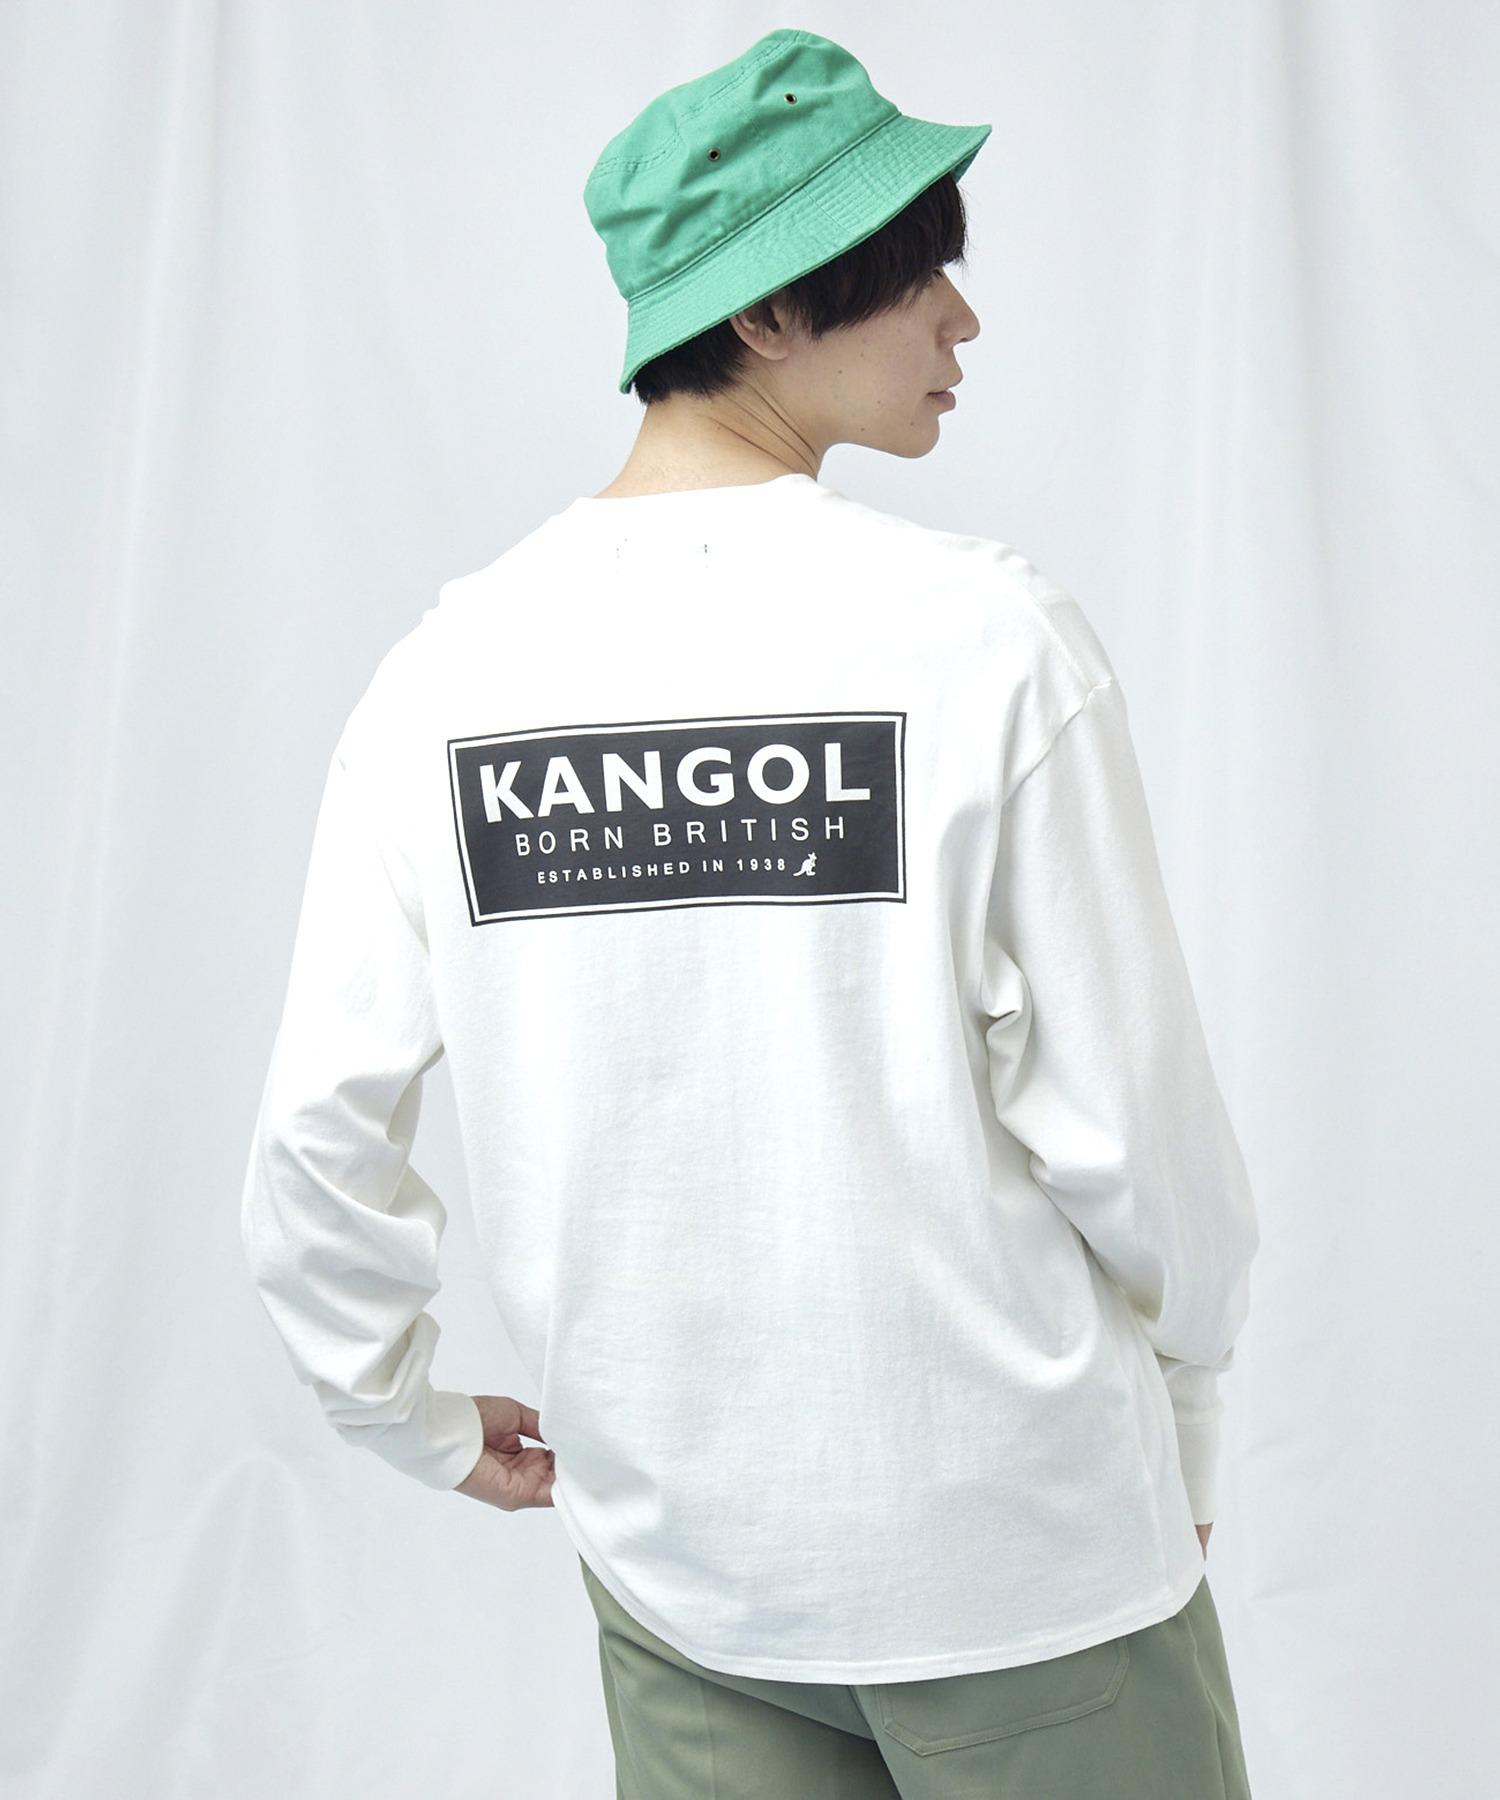 KANGOL/カンゴール コラボ 別注ロゴ刺繍 L/S オーバーサイズカットソー -2021SPRING STYLE-